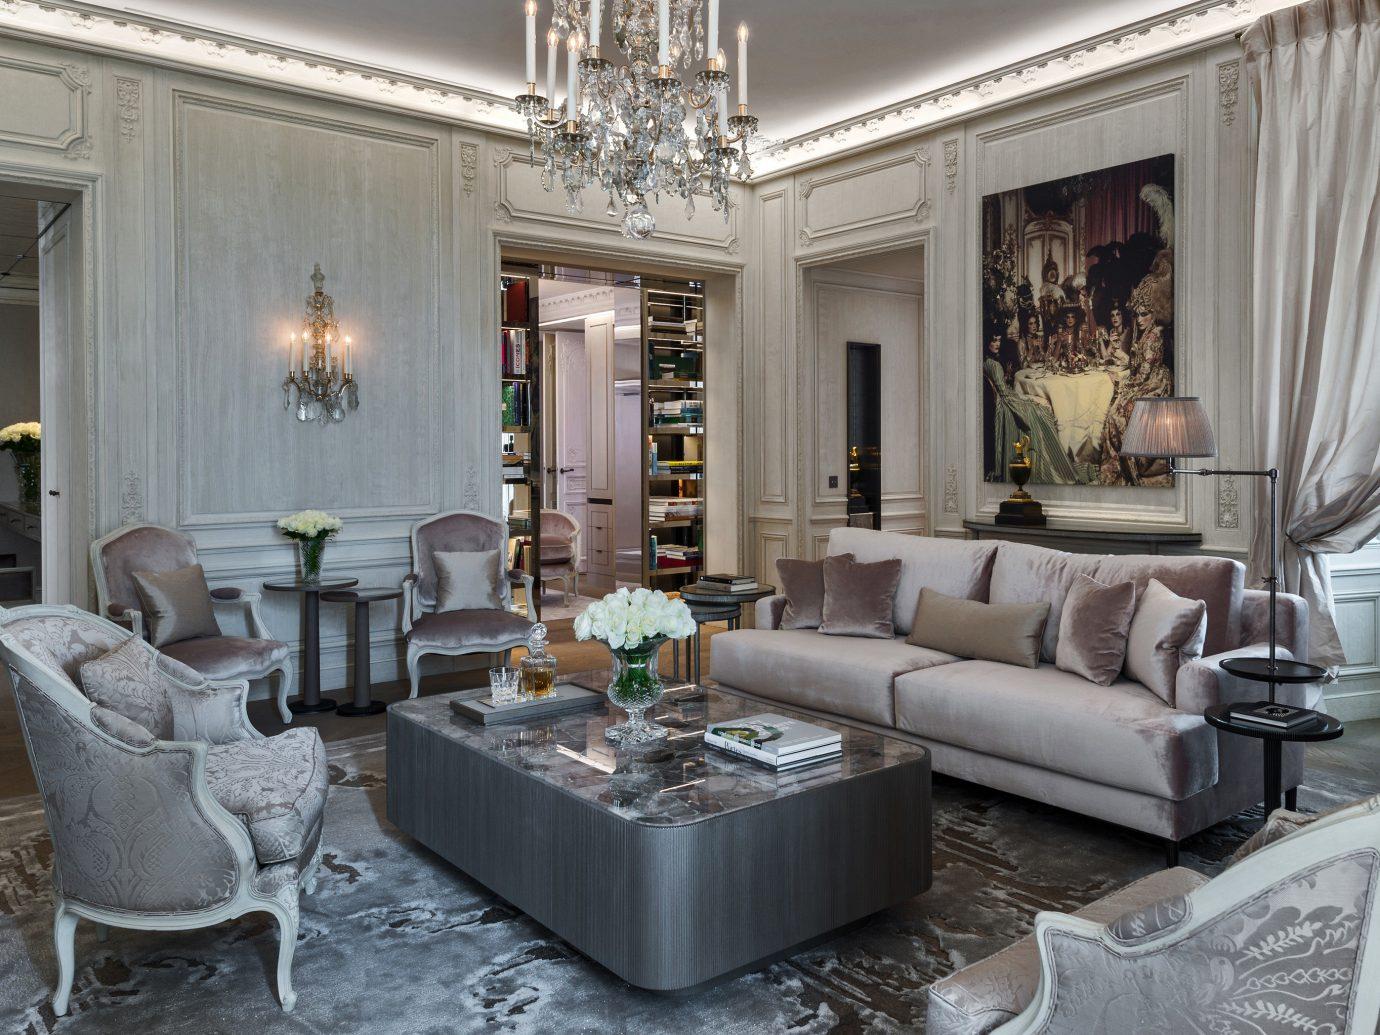 Hotels Luxury Travel indoor living room Living interior design room home ceiling furniture real estate estate Lobby window Suite interior designer couch stone